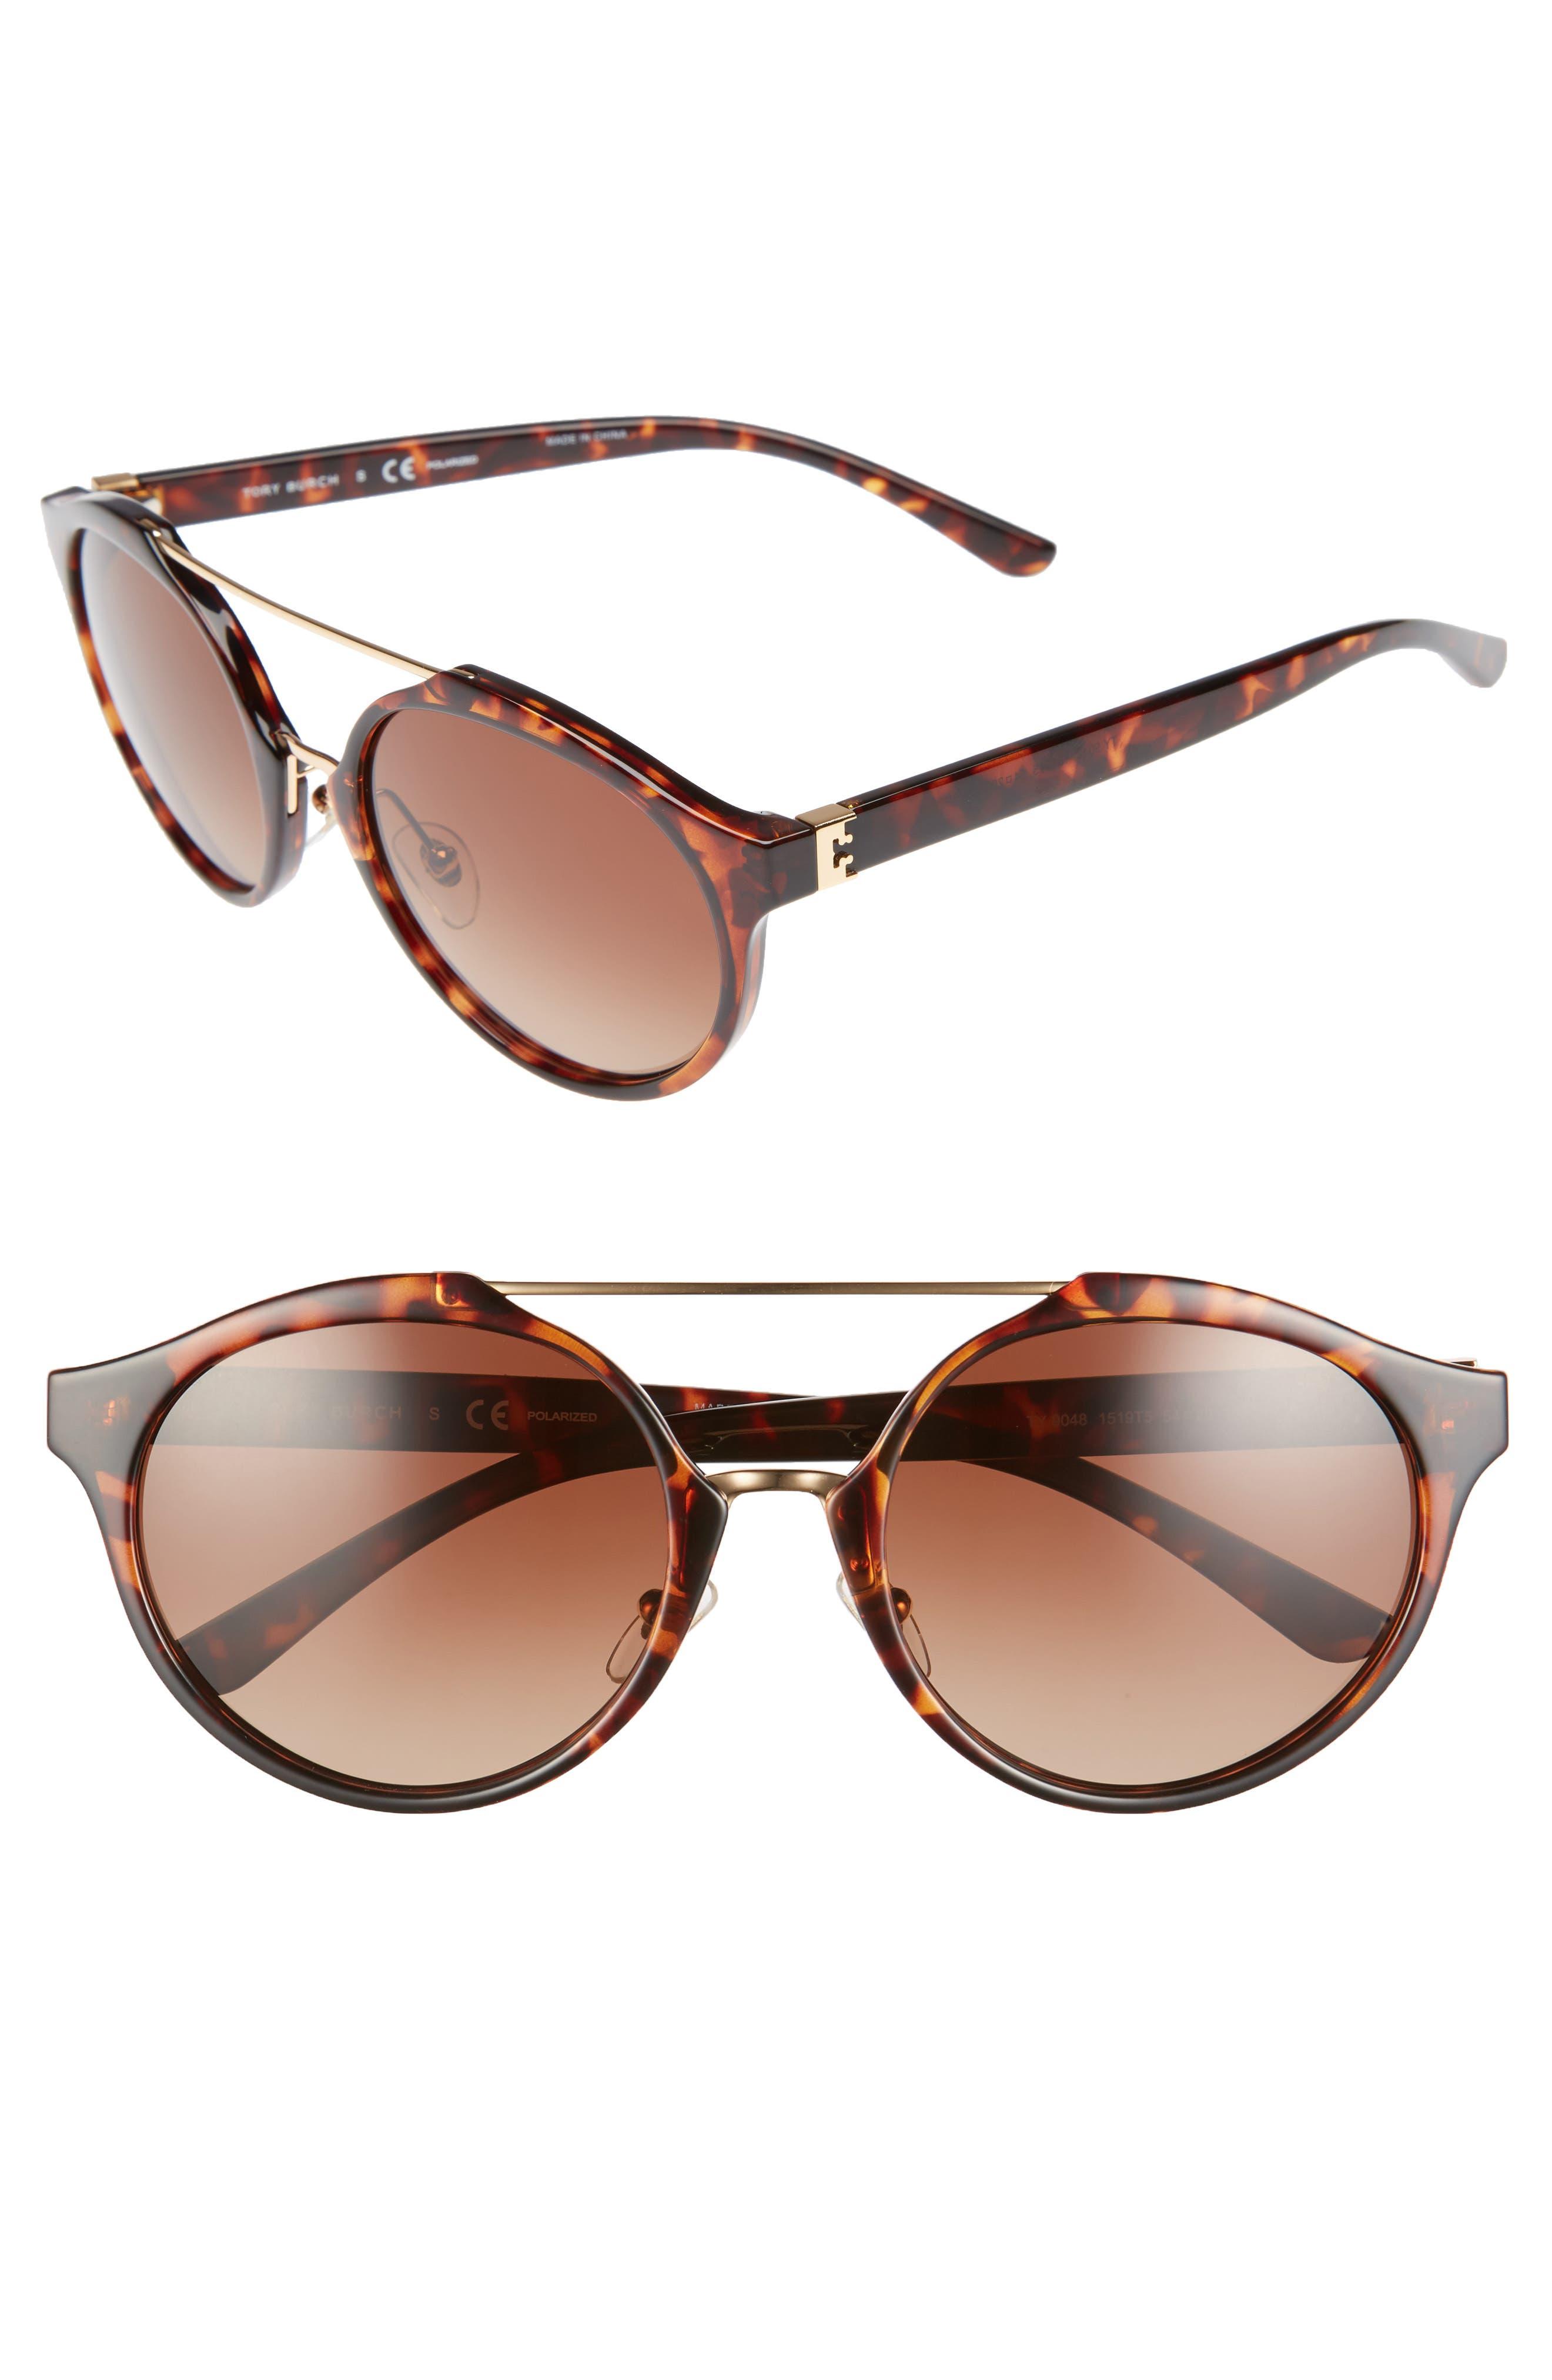 54mm Polarized Sunglasses,                             Main thumbnail 1, color,                             200